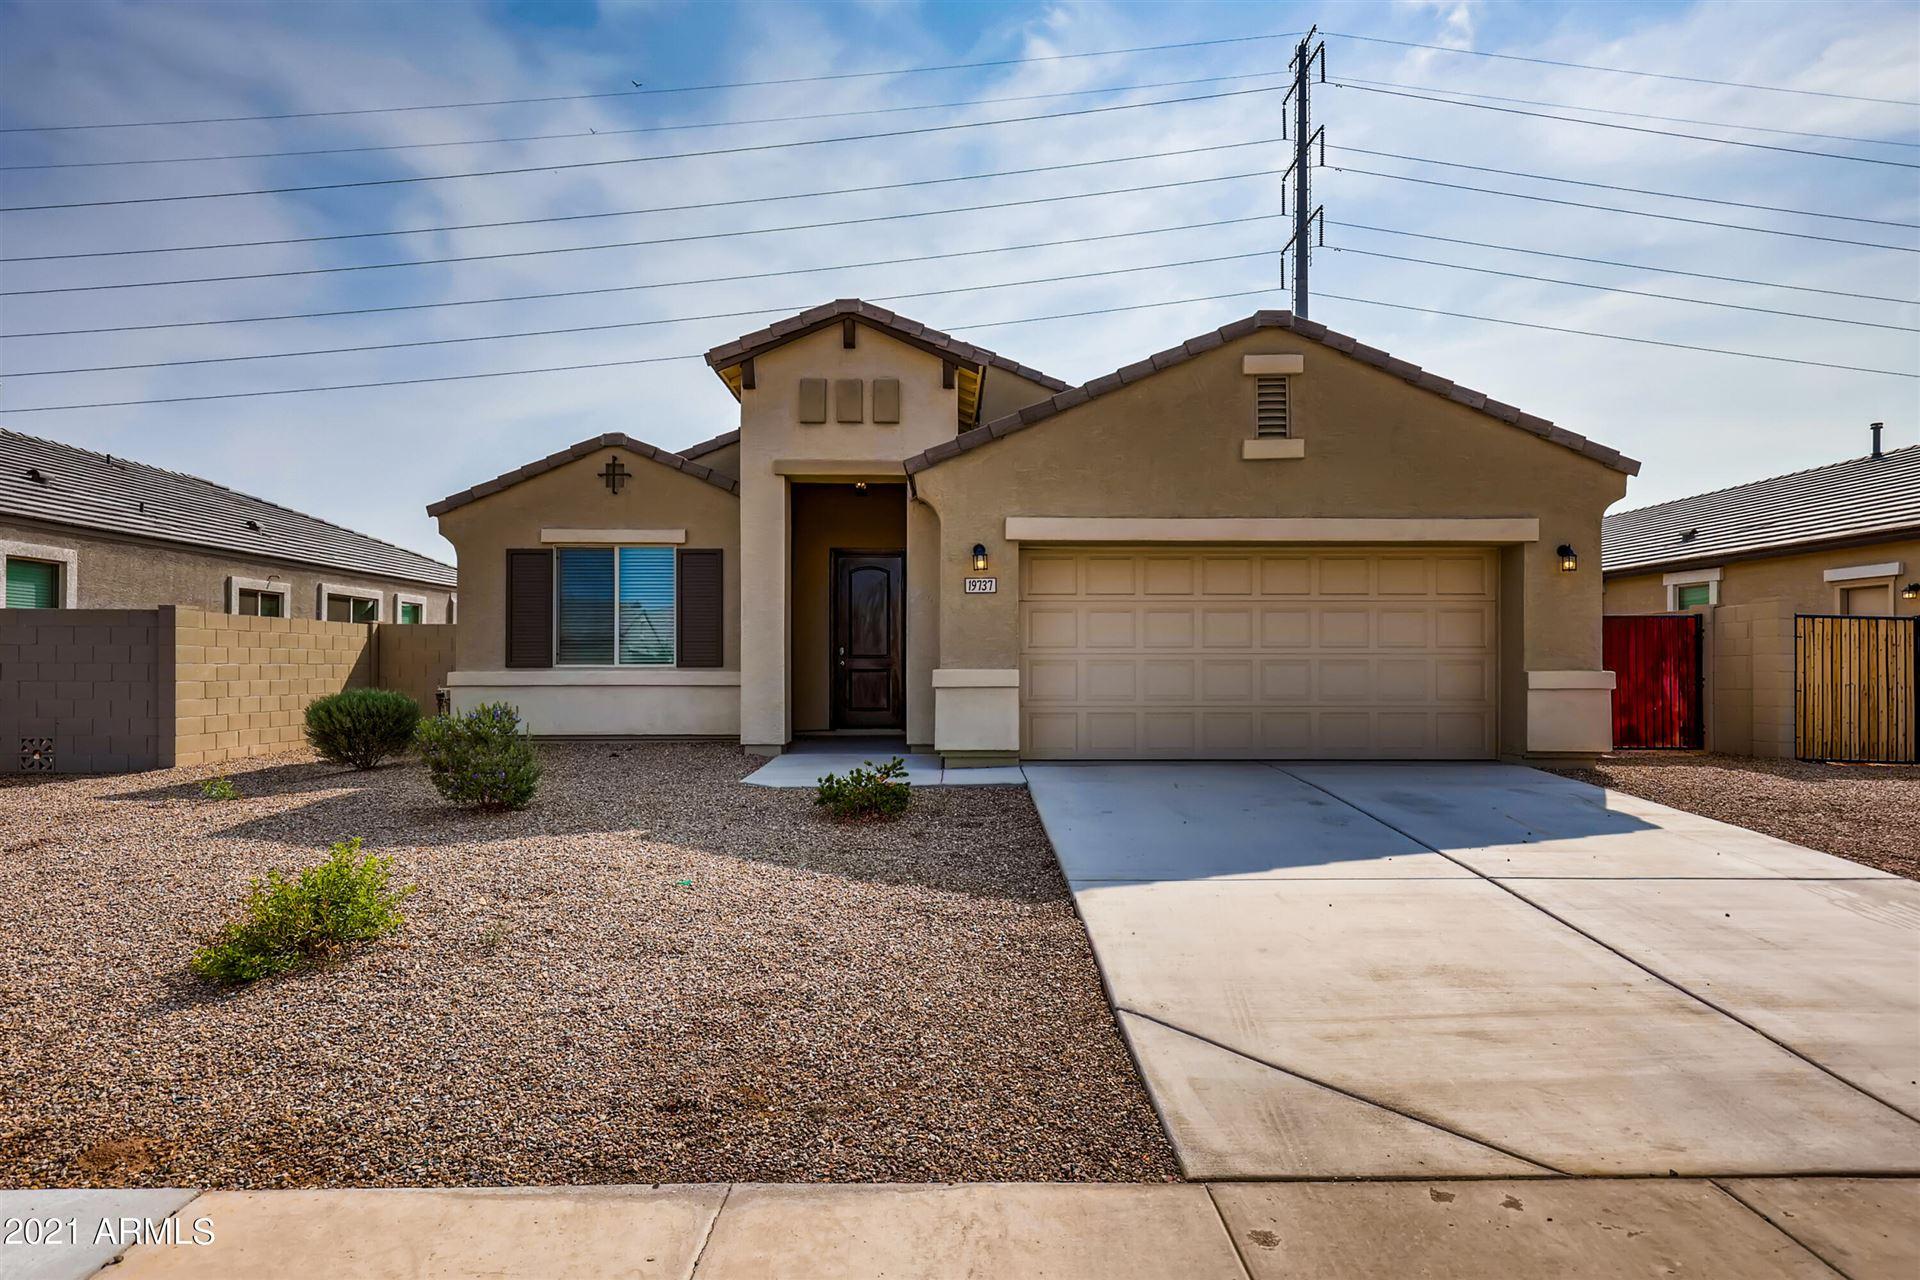 Photo for 19737 N HERBERT Avenue, Maricopa, AZ 85138 (MLS # 6267335)